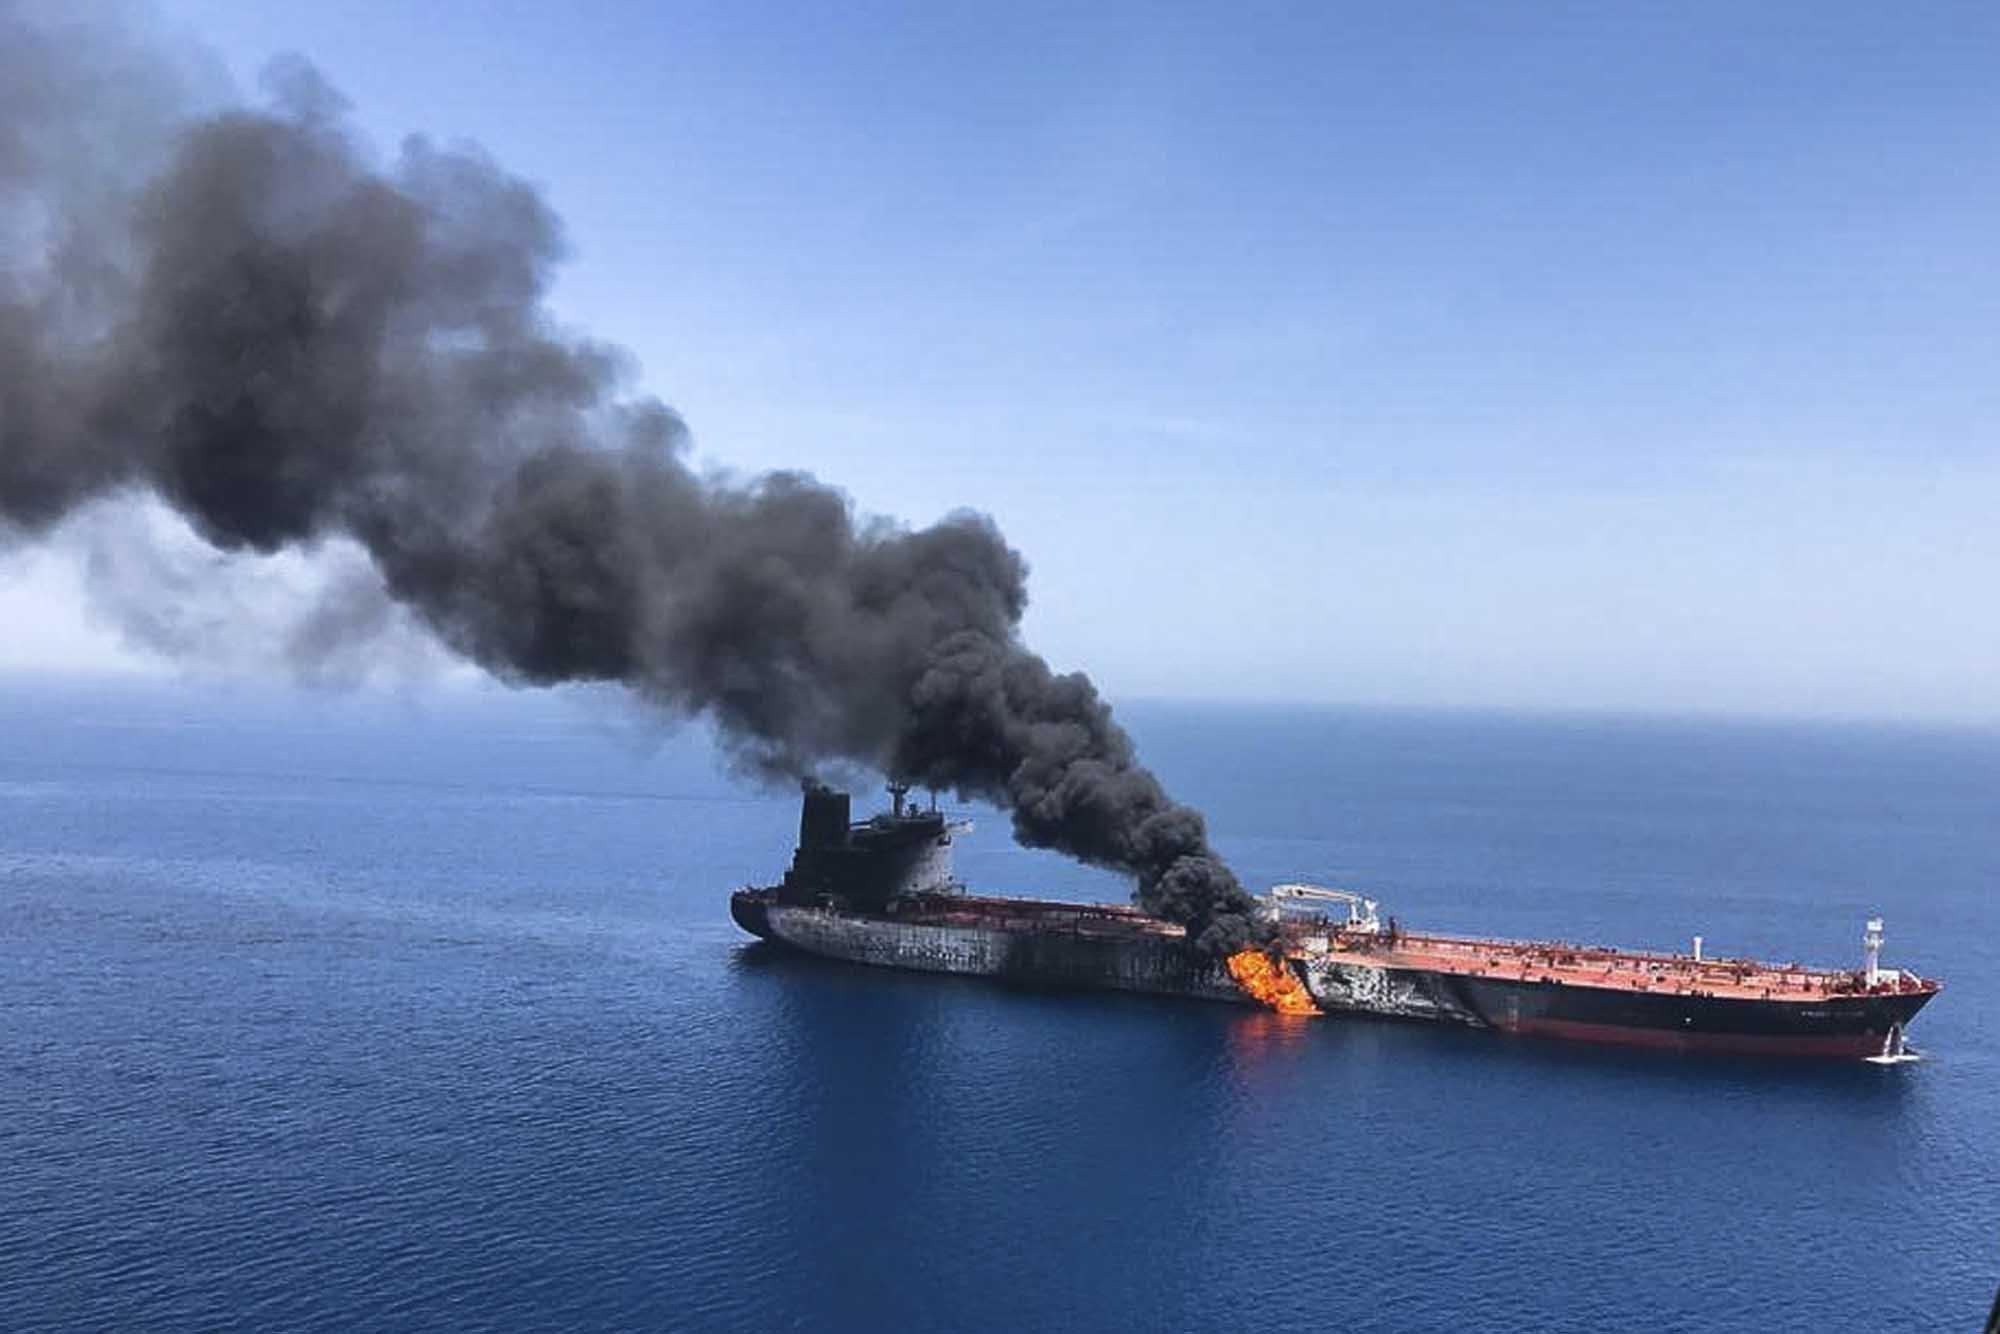 An oil tanker is seen on fire in the sea of Oman on June 13, 2019. (Credit: AP via CNN)